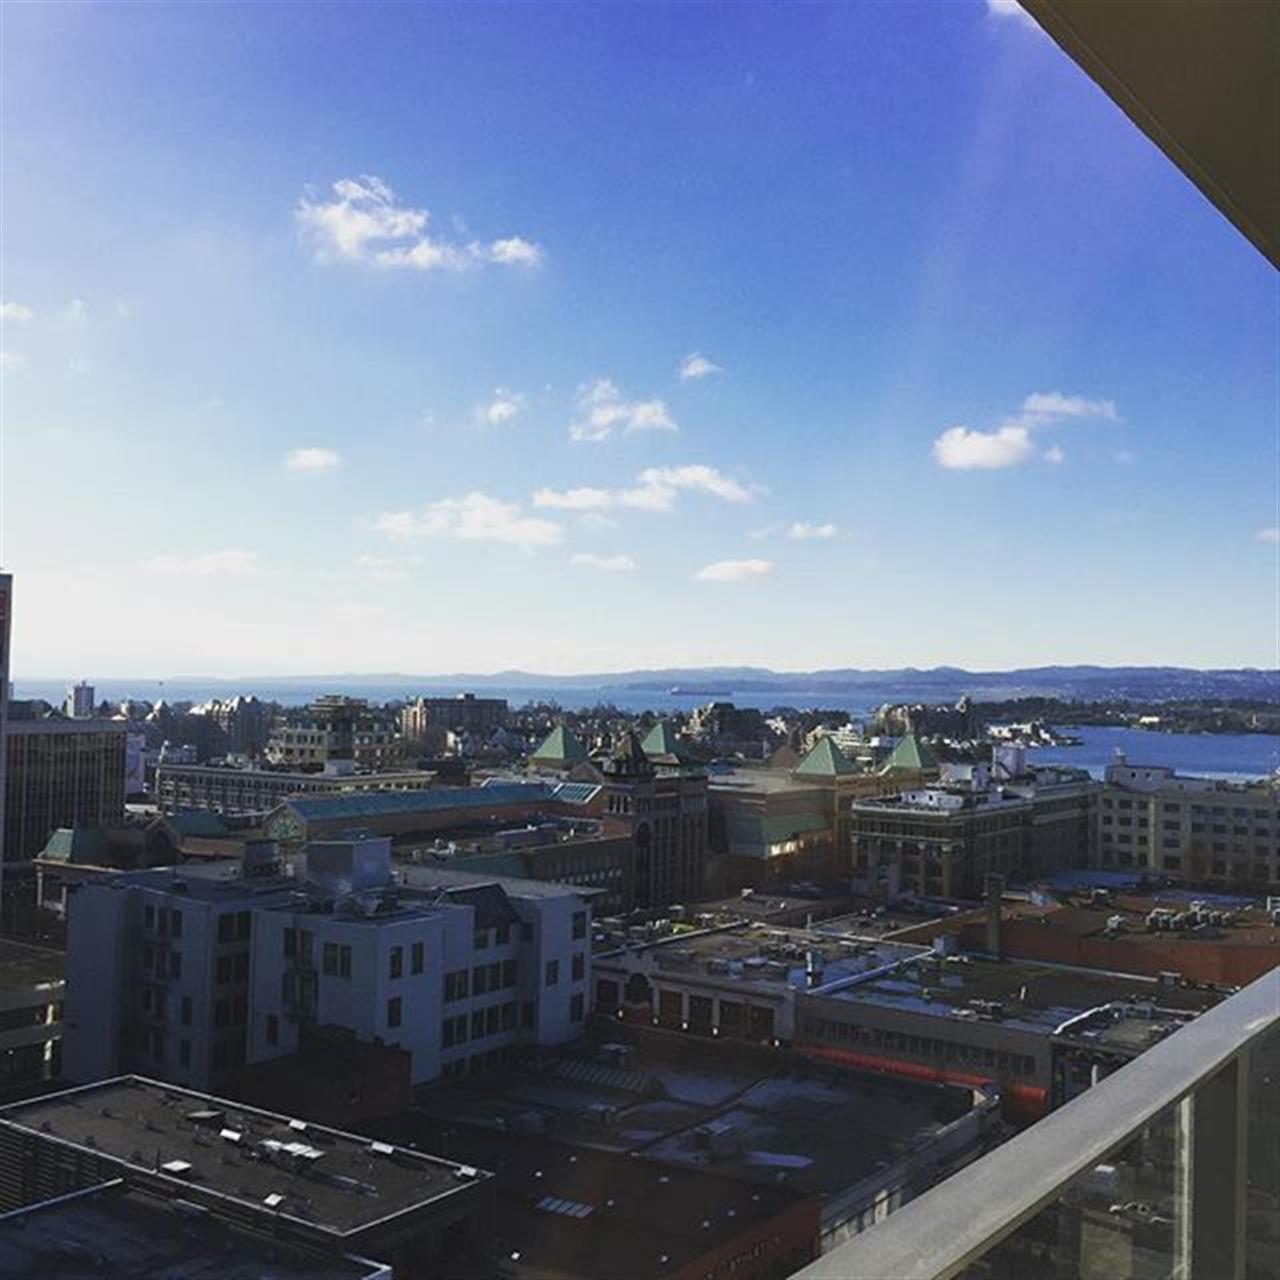 #15thfloor #condo #beautifulwinterday #victoriabccanada #downtown #realestateagent #realtorlife #realtor #realestate #leadingrelocal #oceanview